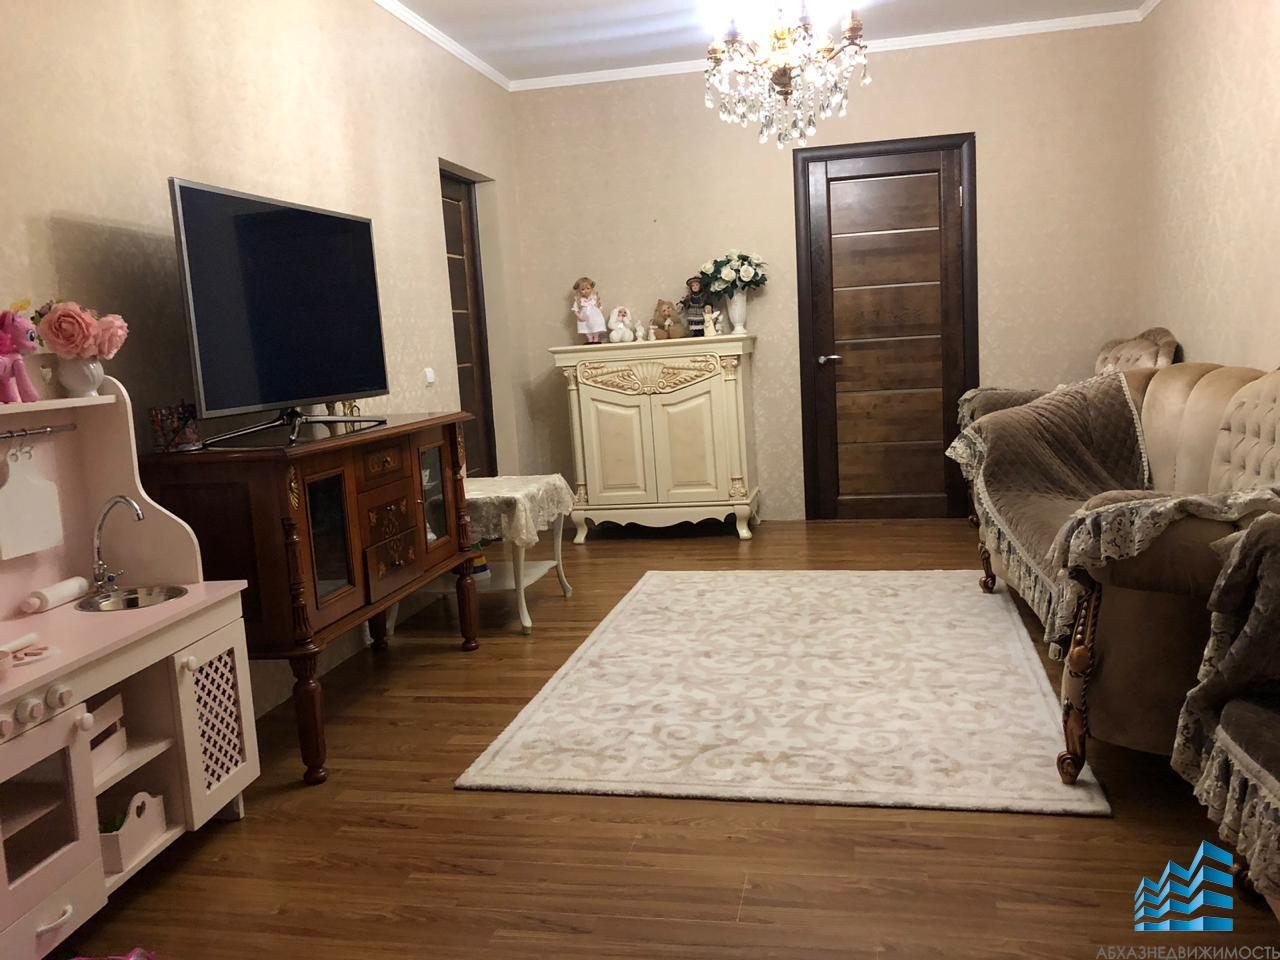 2-комнатная квартира в Сухуме за 1 550 тыс.руб